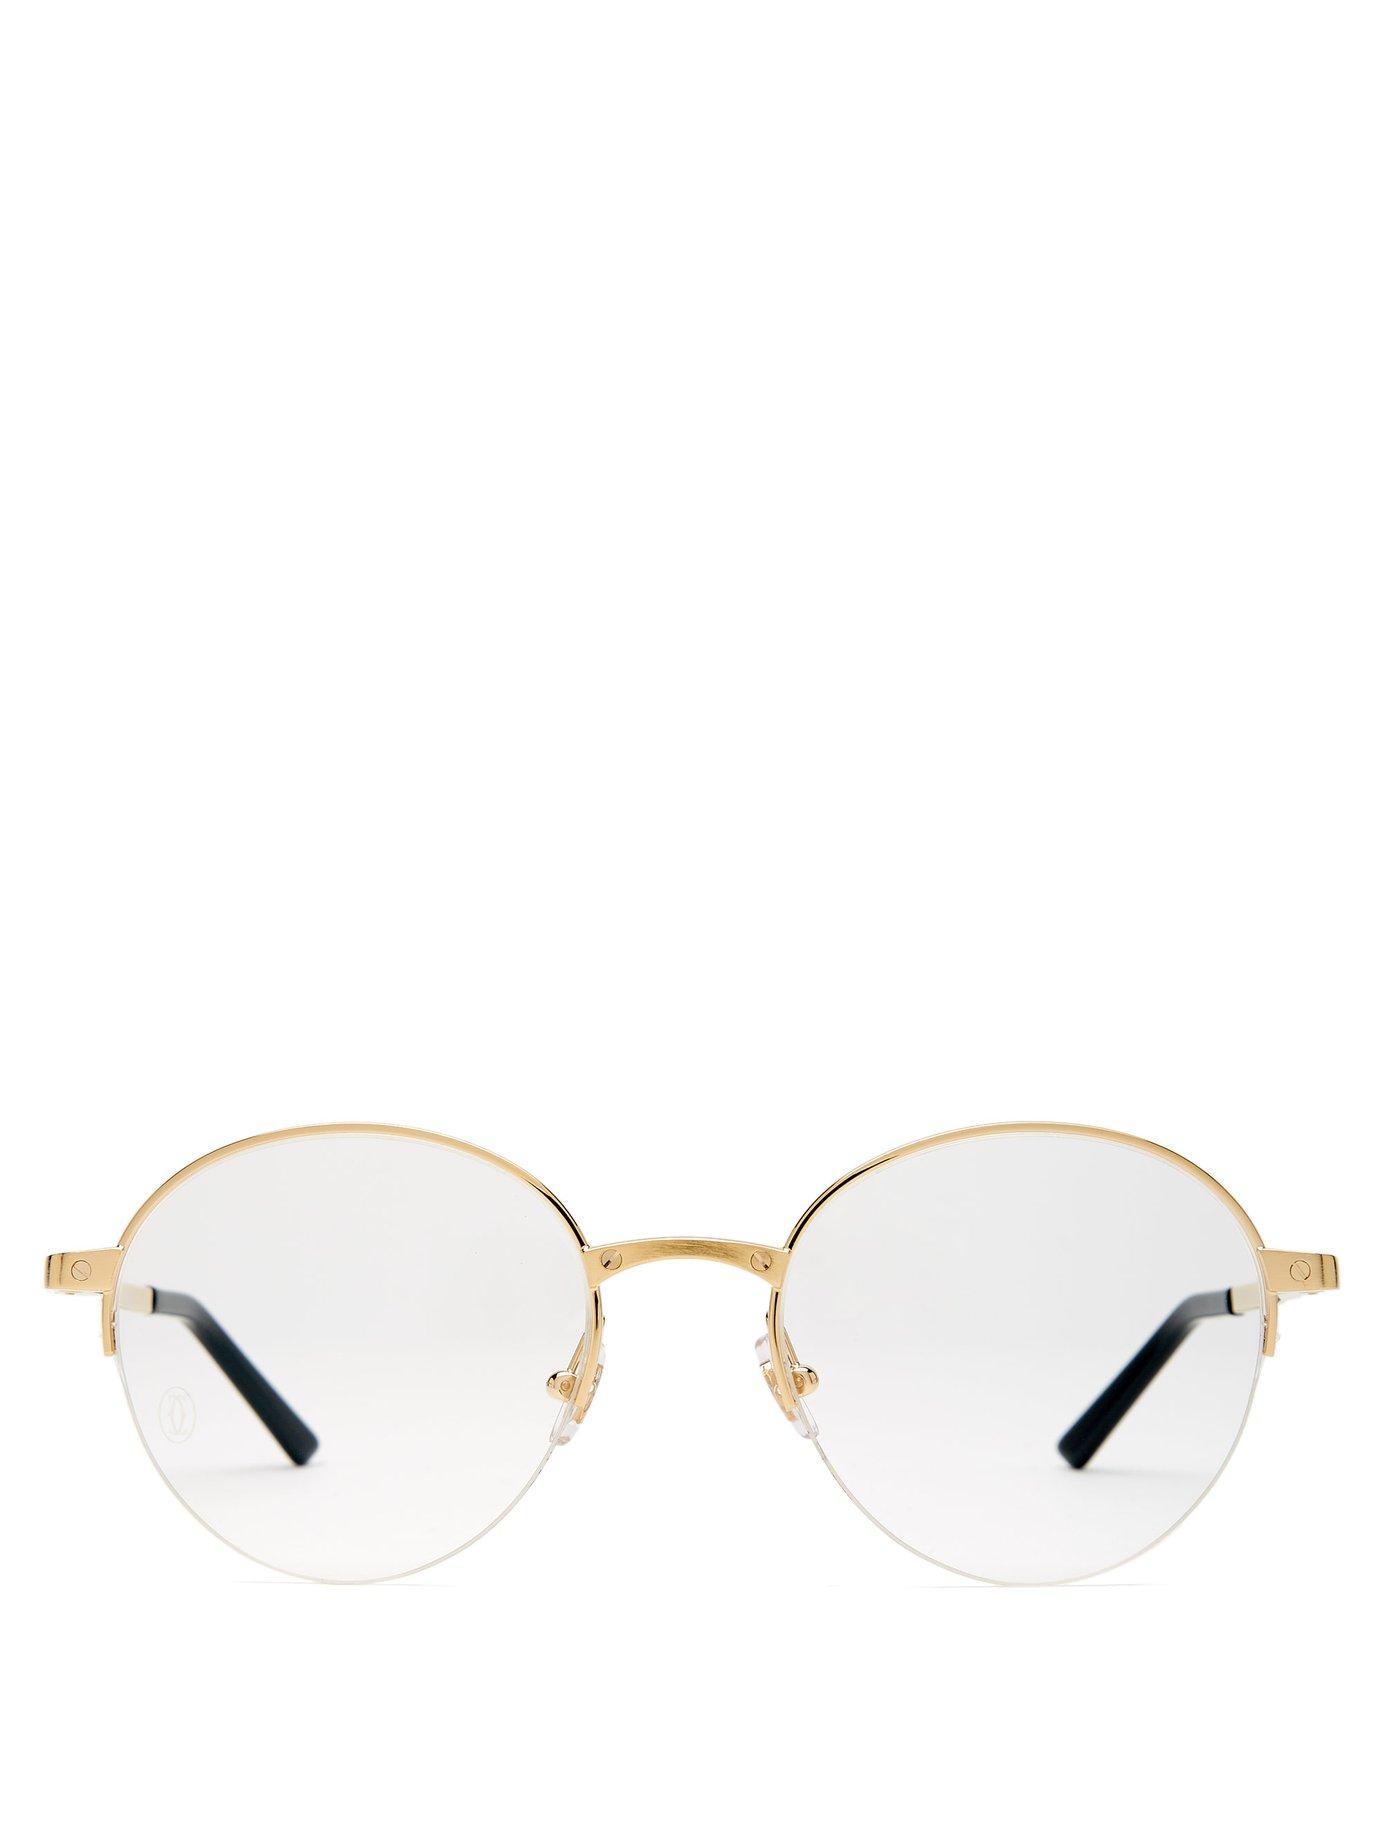 3c2df24bb718 Lyst - Cartier Santos De Cartier Round Frame Glasses in Metallic for Men